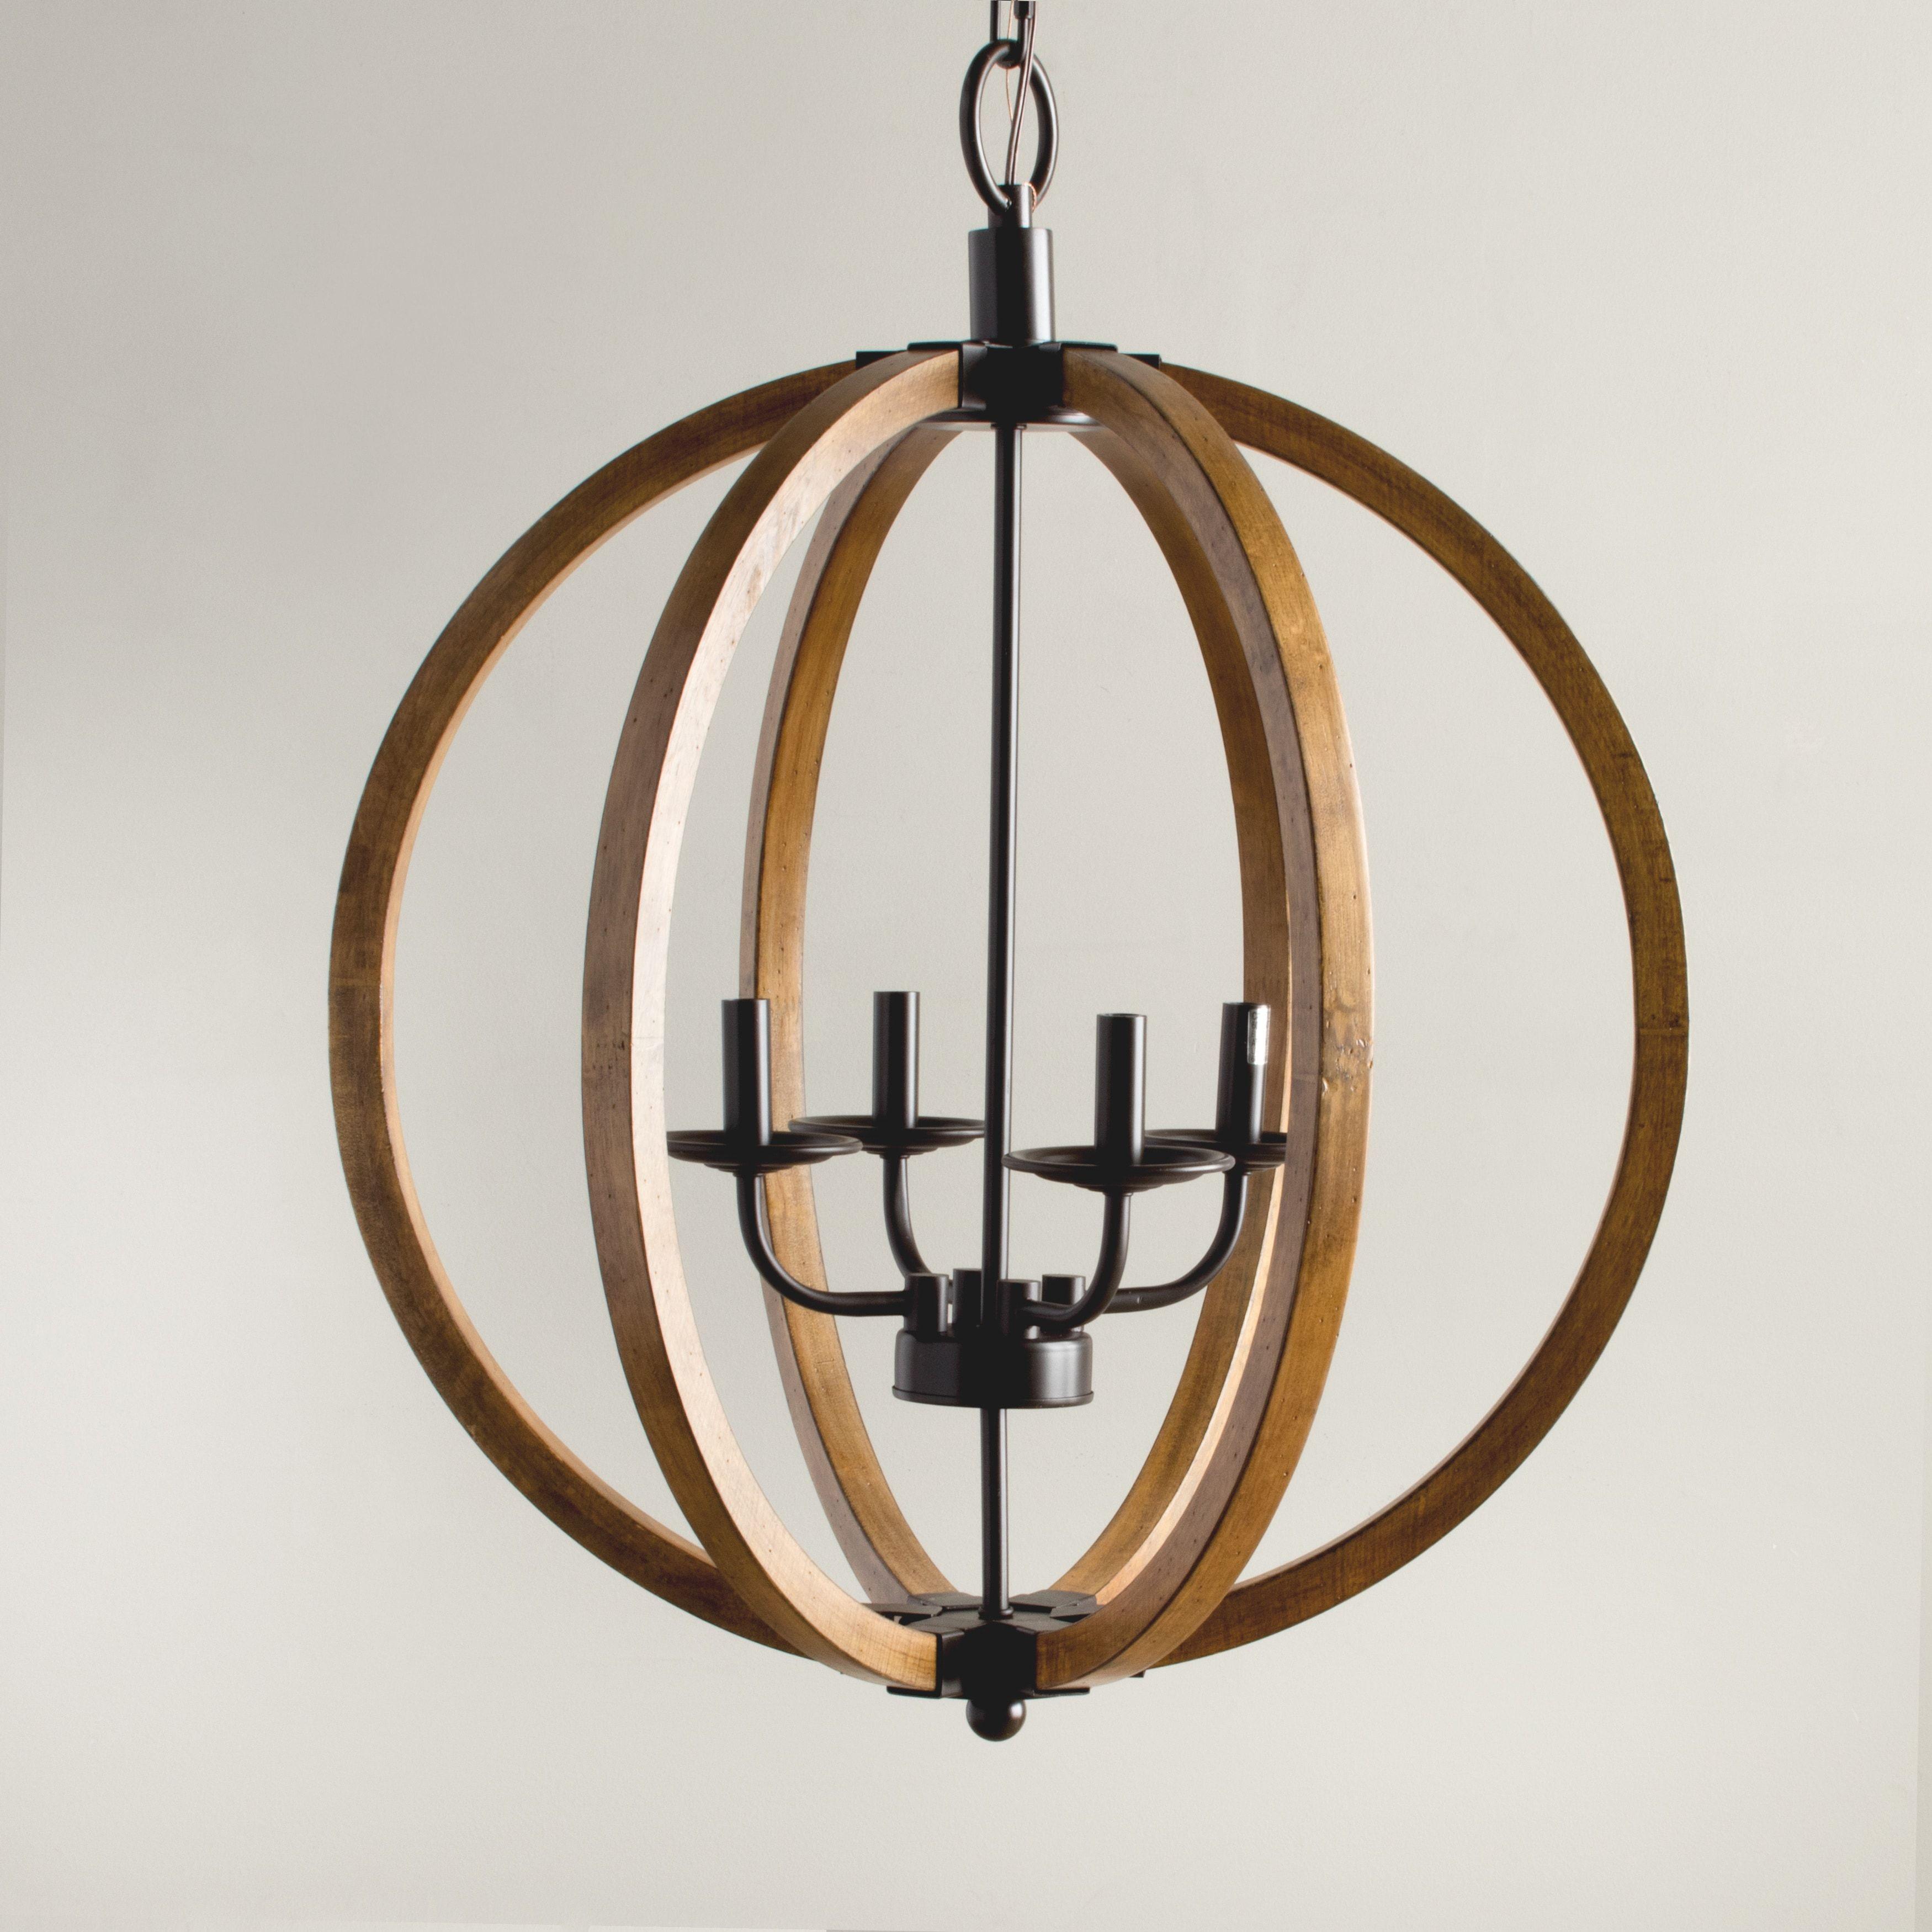 Vineyard Distressed Mahogany And Bronze 4 Light Orb